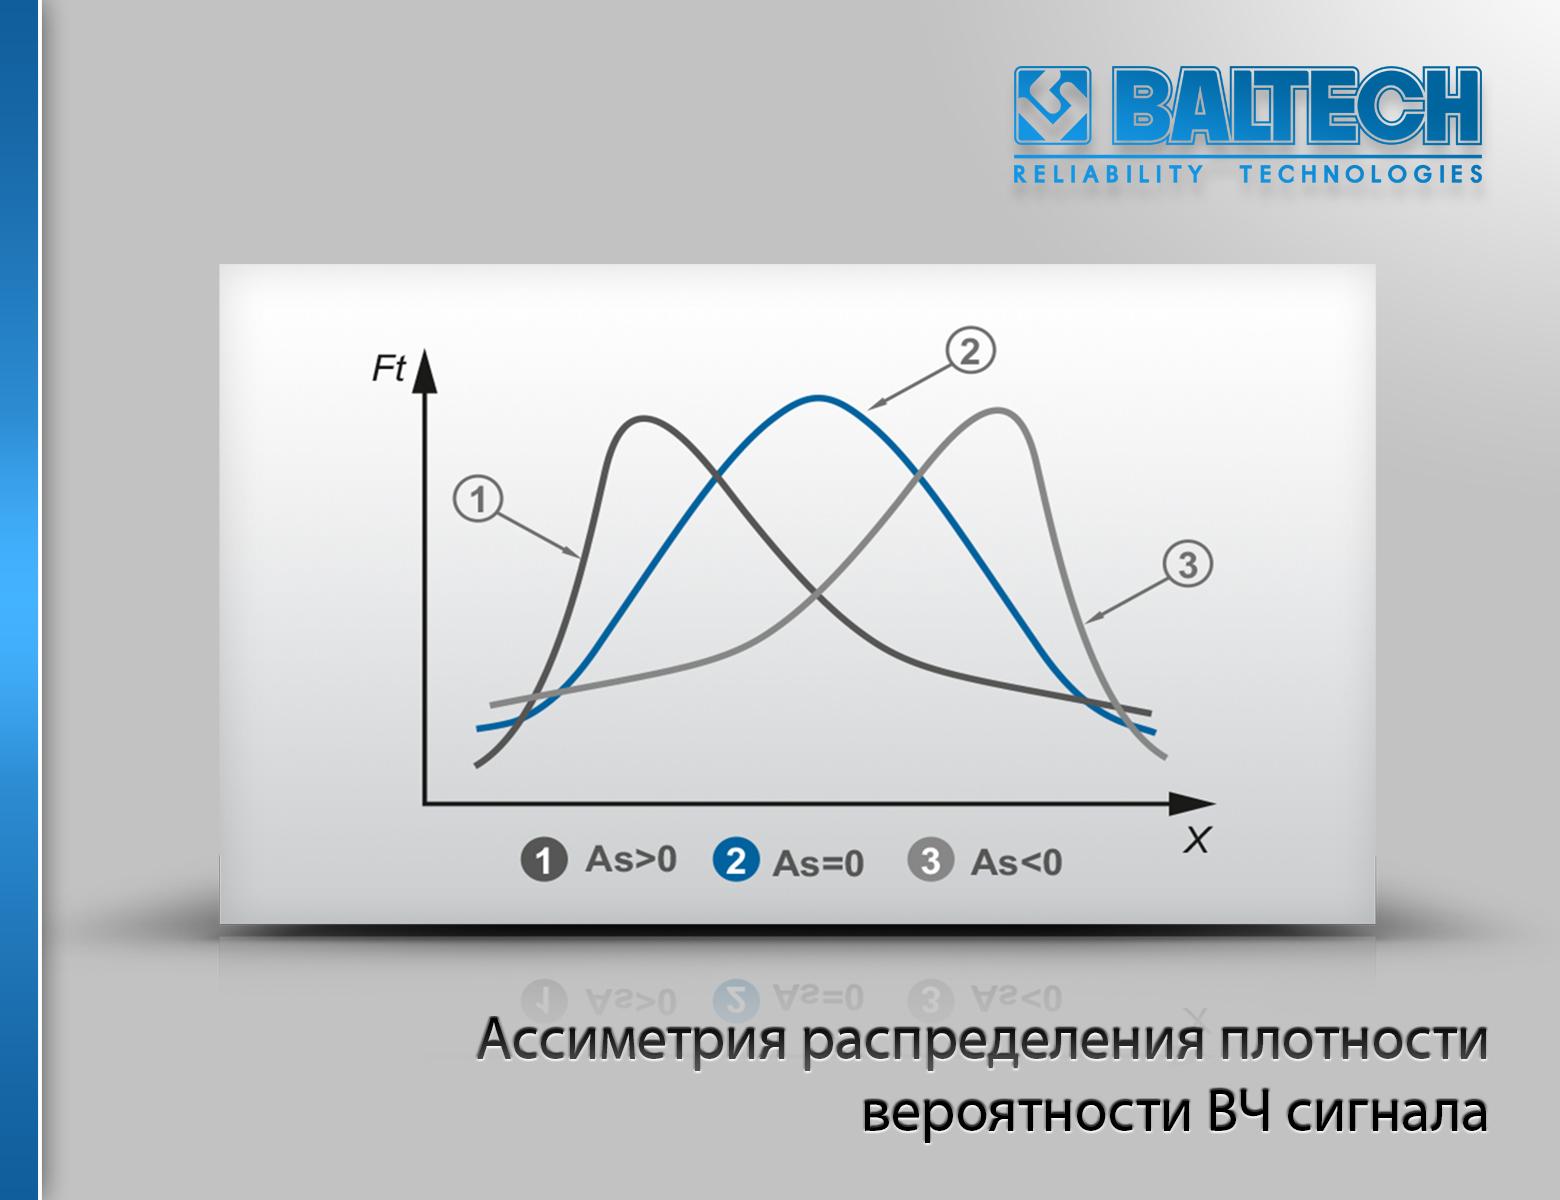 Анализ вибрации, ассиметрия распределения плотности вероятности ВЧ сигнала, эксцесс, вибродиагностика